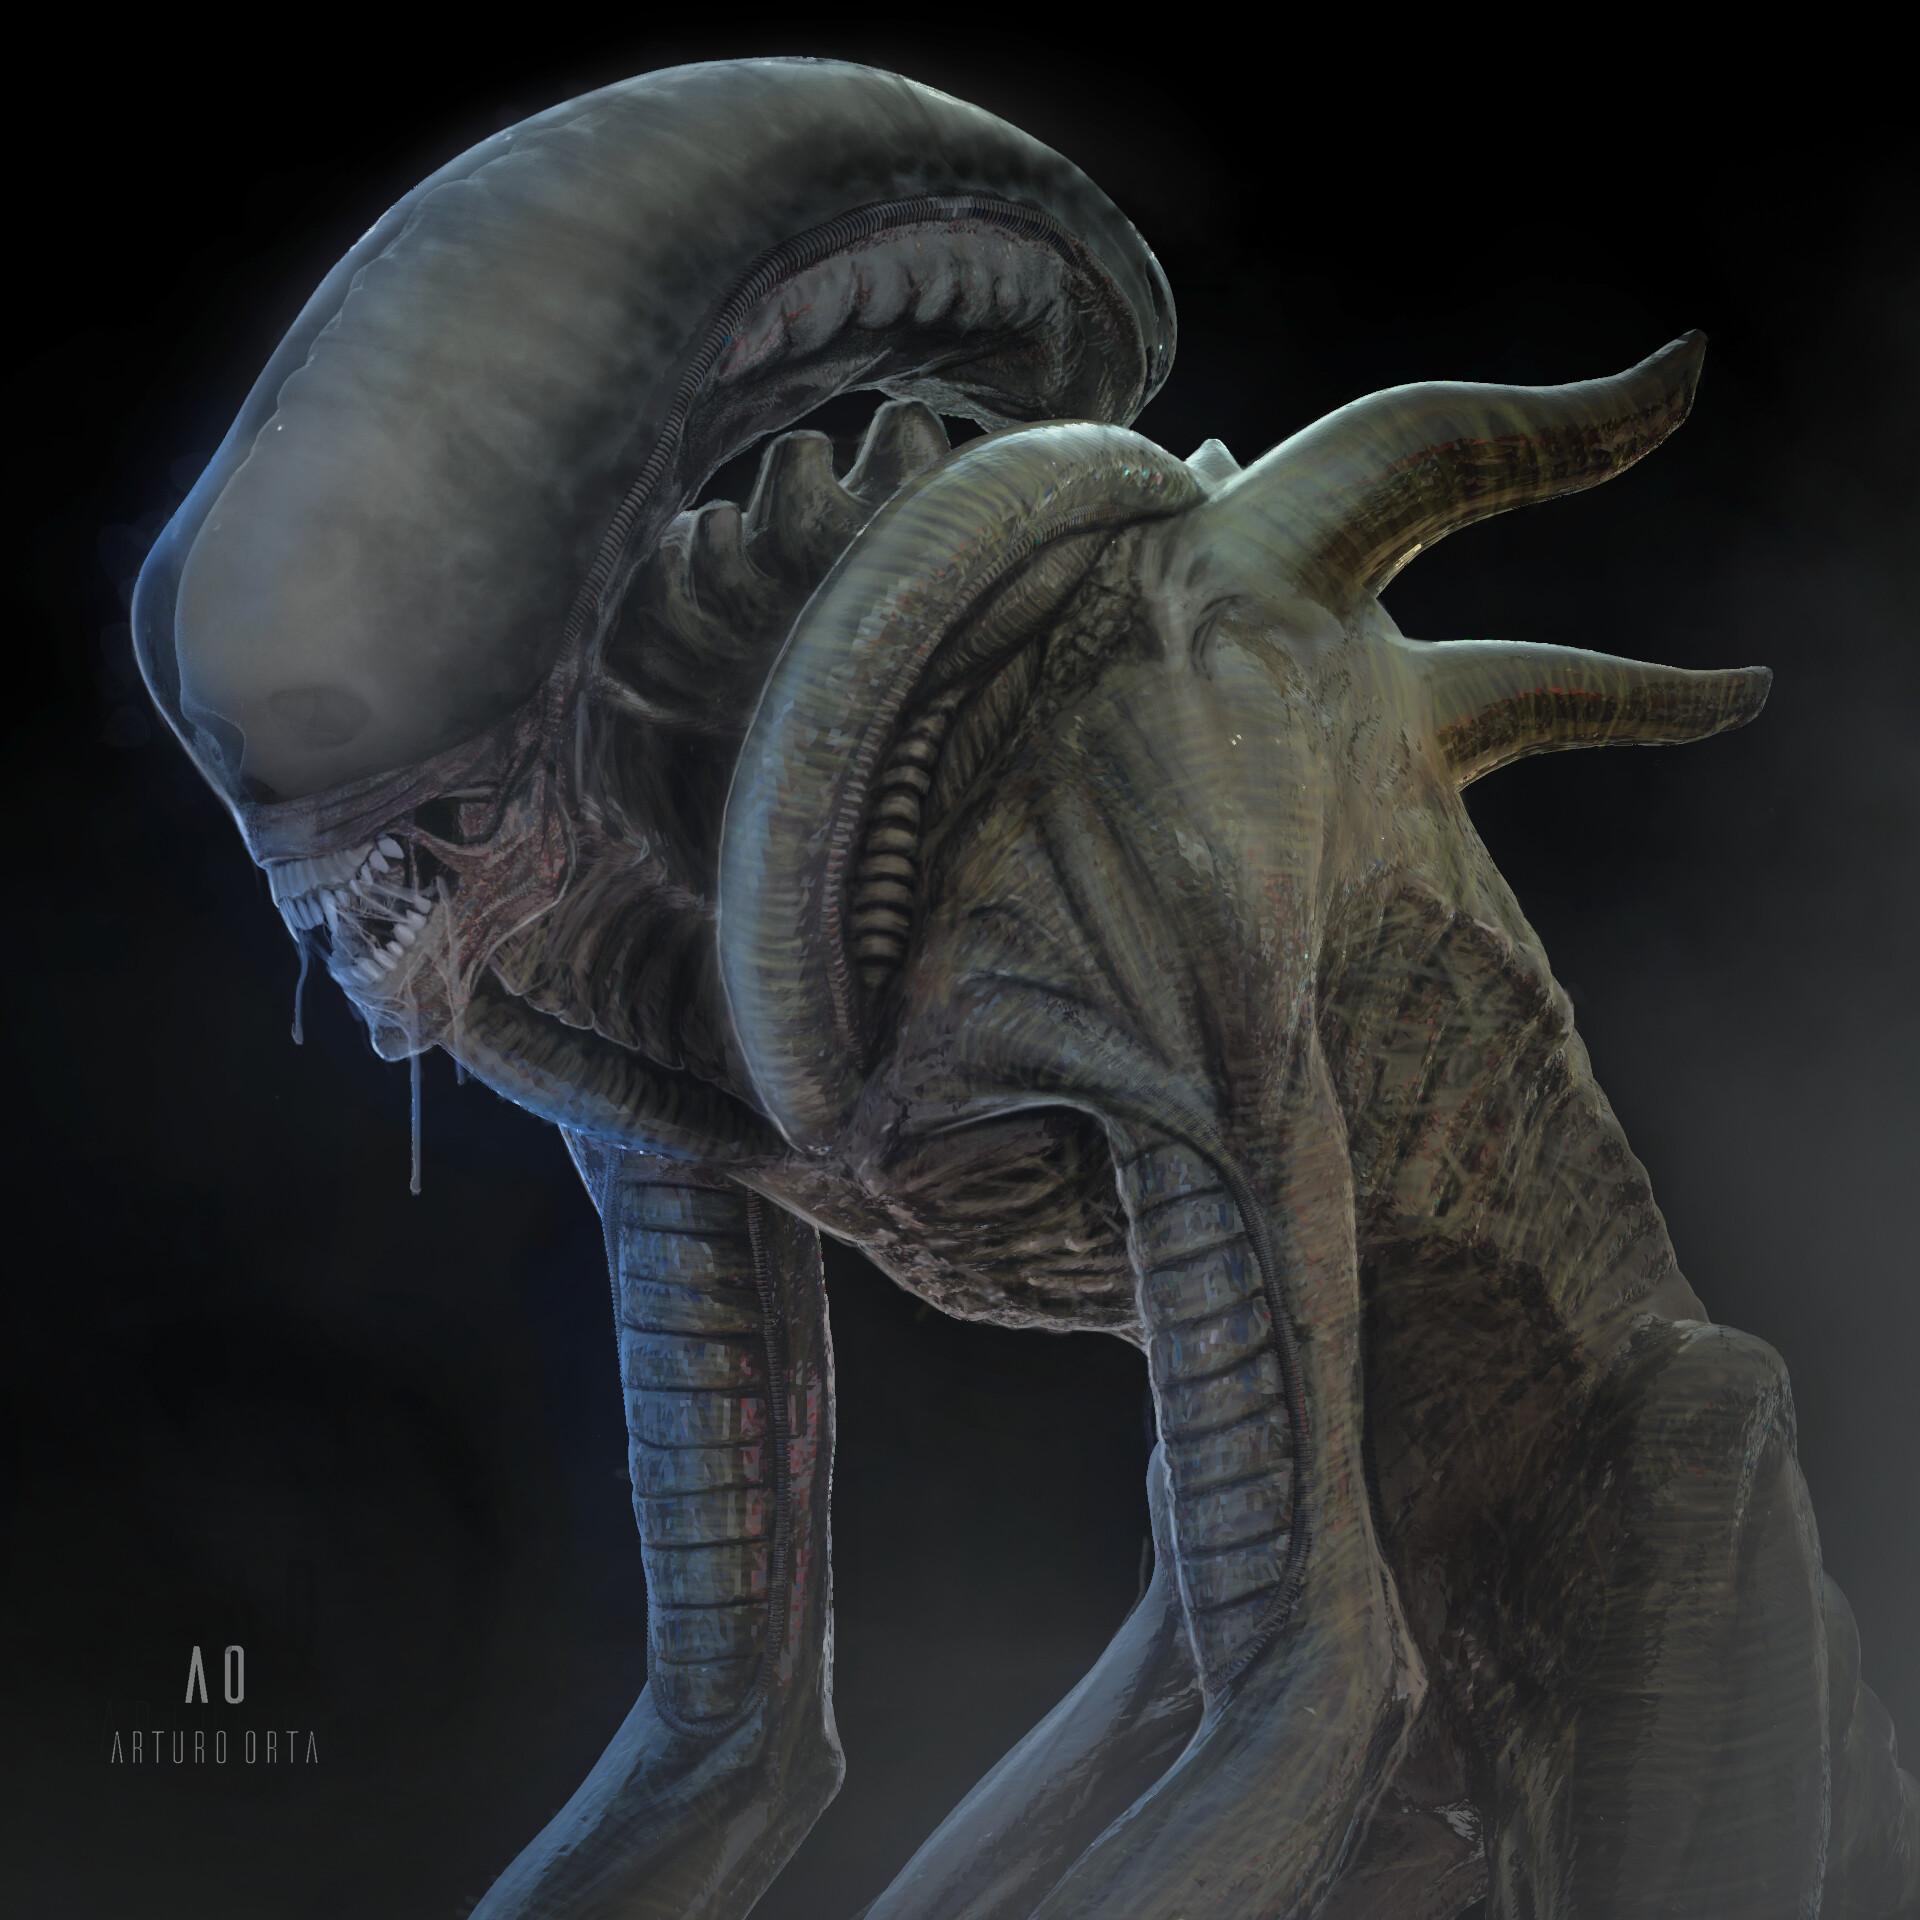 Arturo Orta - Xenomorphs!